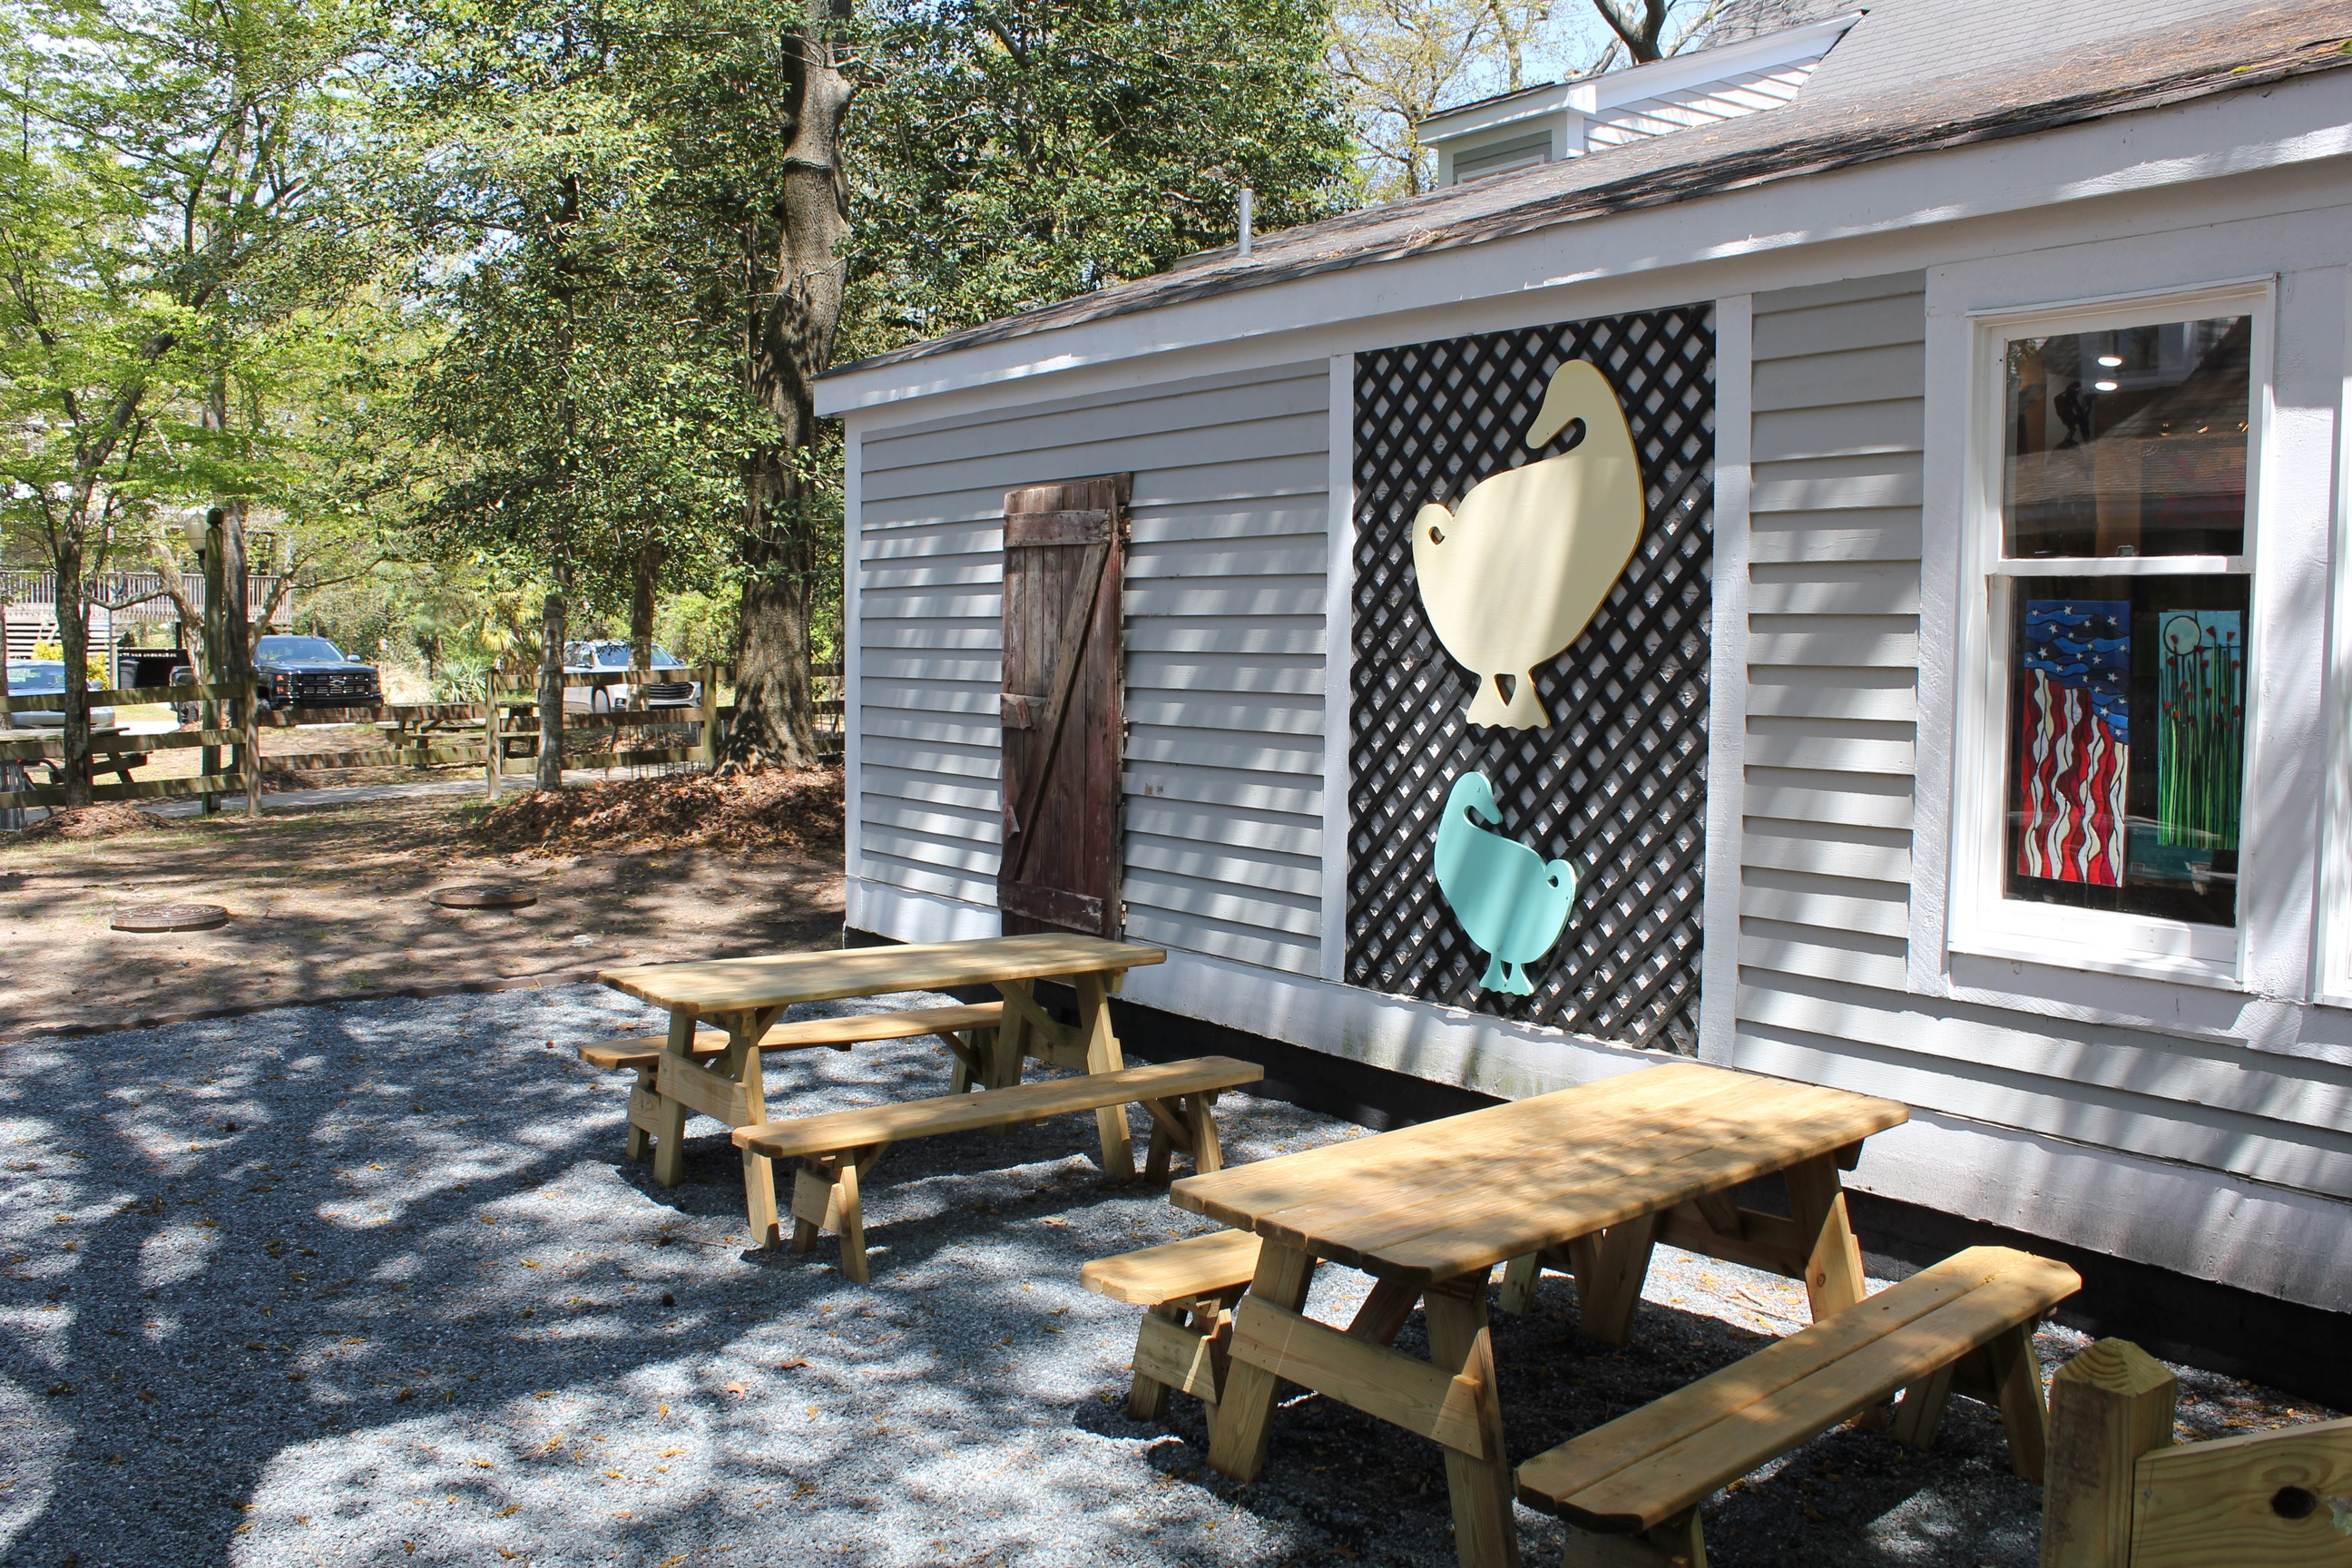 Scarborough Faire Shopping Village Outdoor Dining Area in Duck, North Carolina. Scarborough Faire Shopping Village Duck (540)272-0975